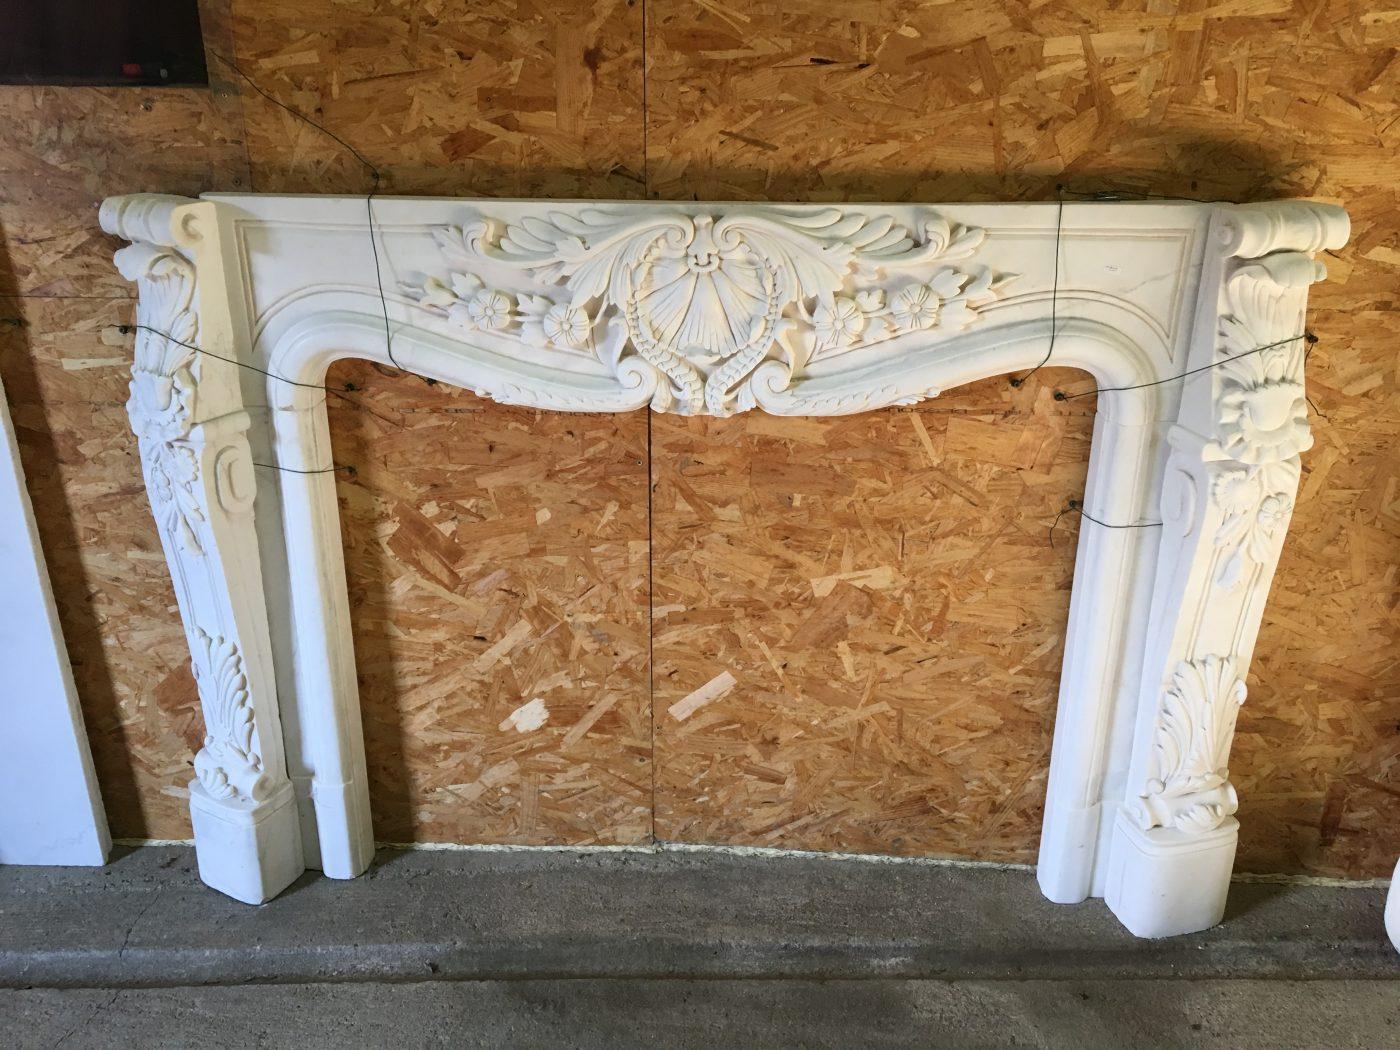 Camino originale in marmo bianco • Antiquariato, Antiquariato da ...